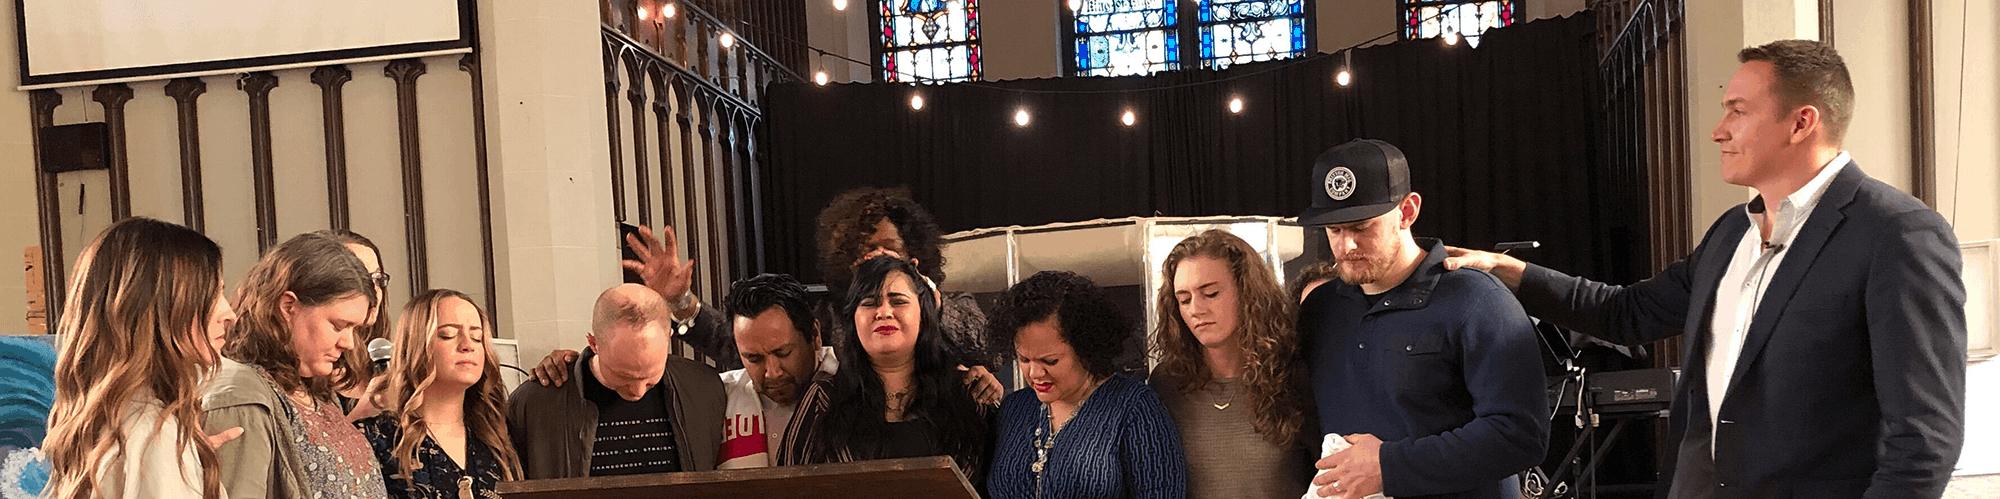 staff prayer Sunday header 19-05